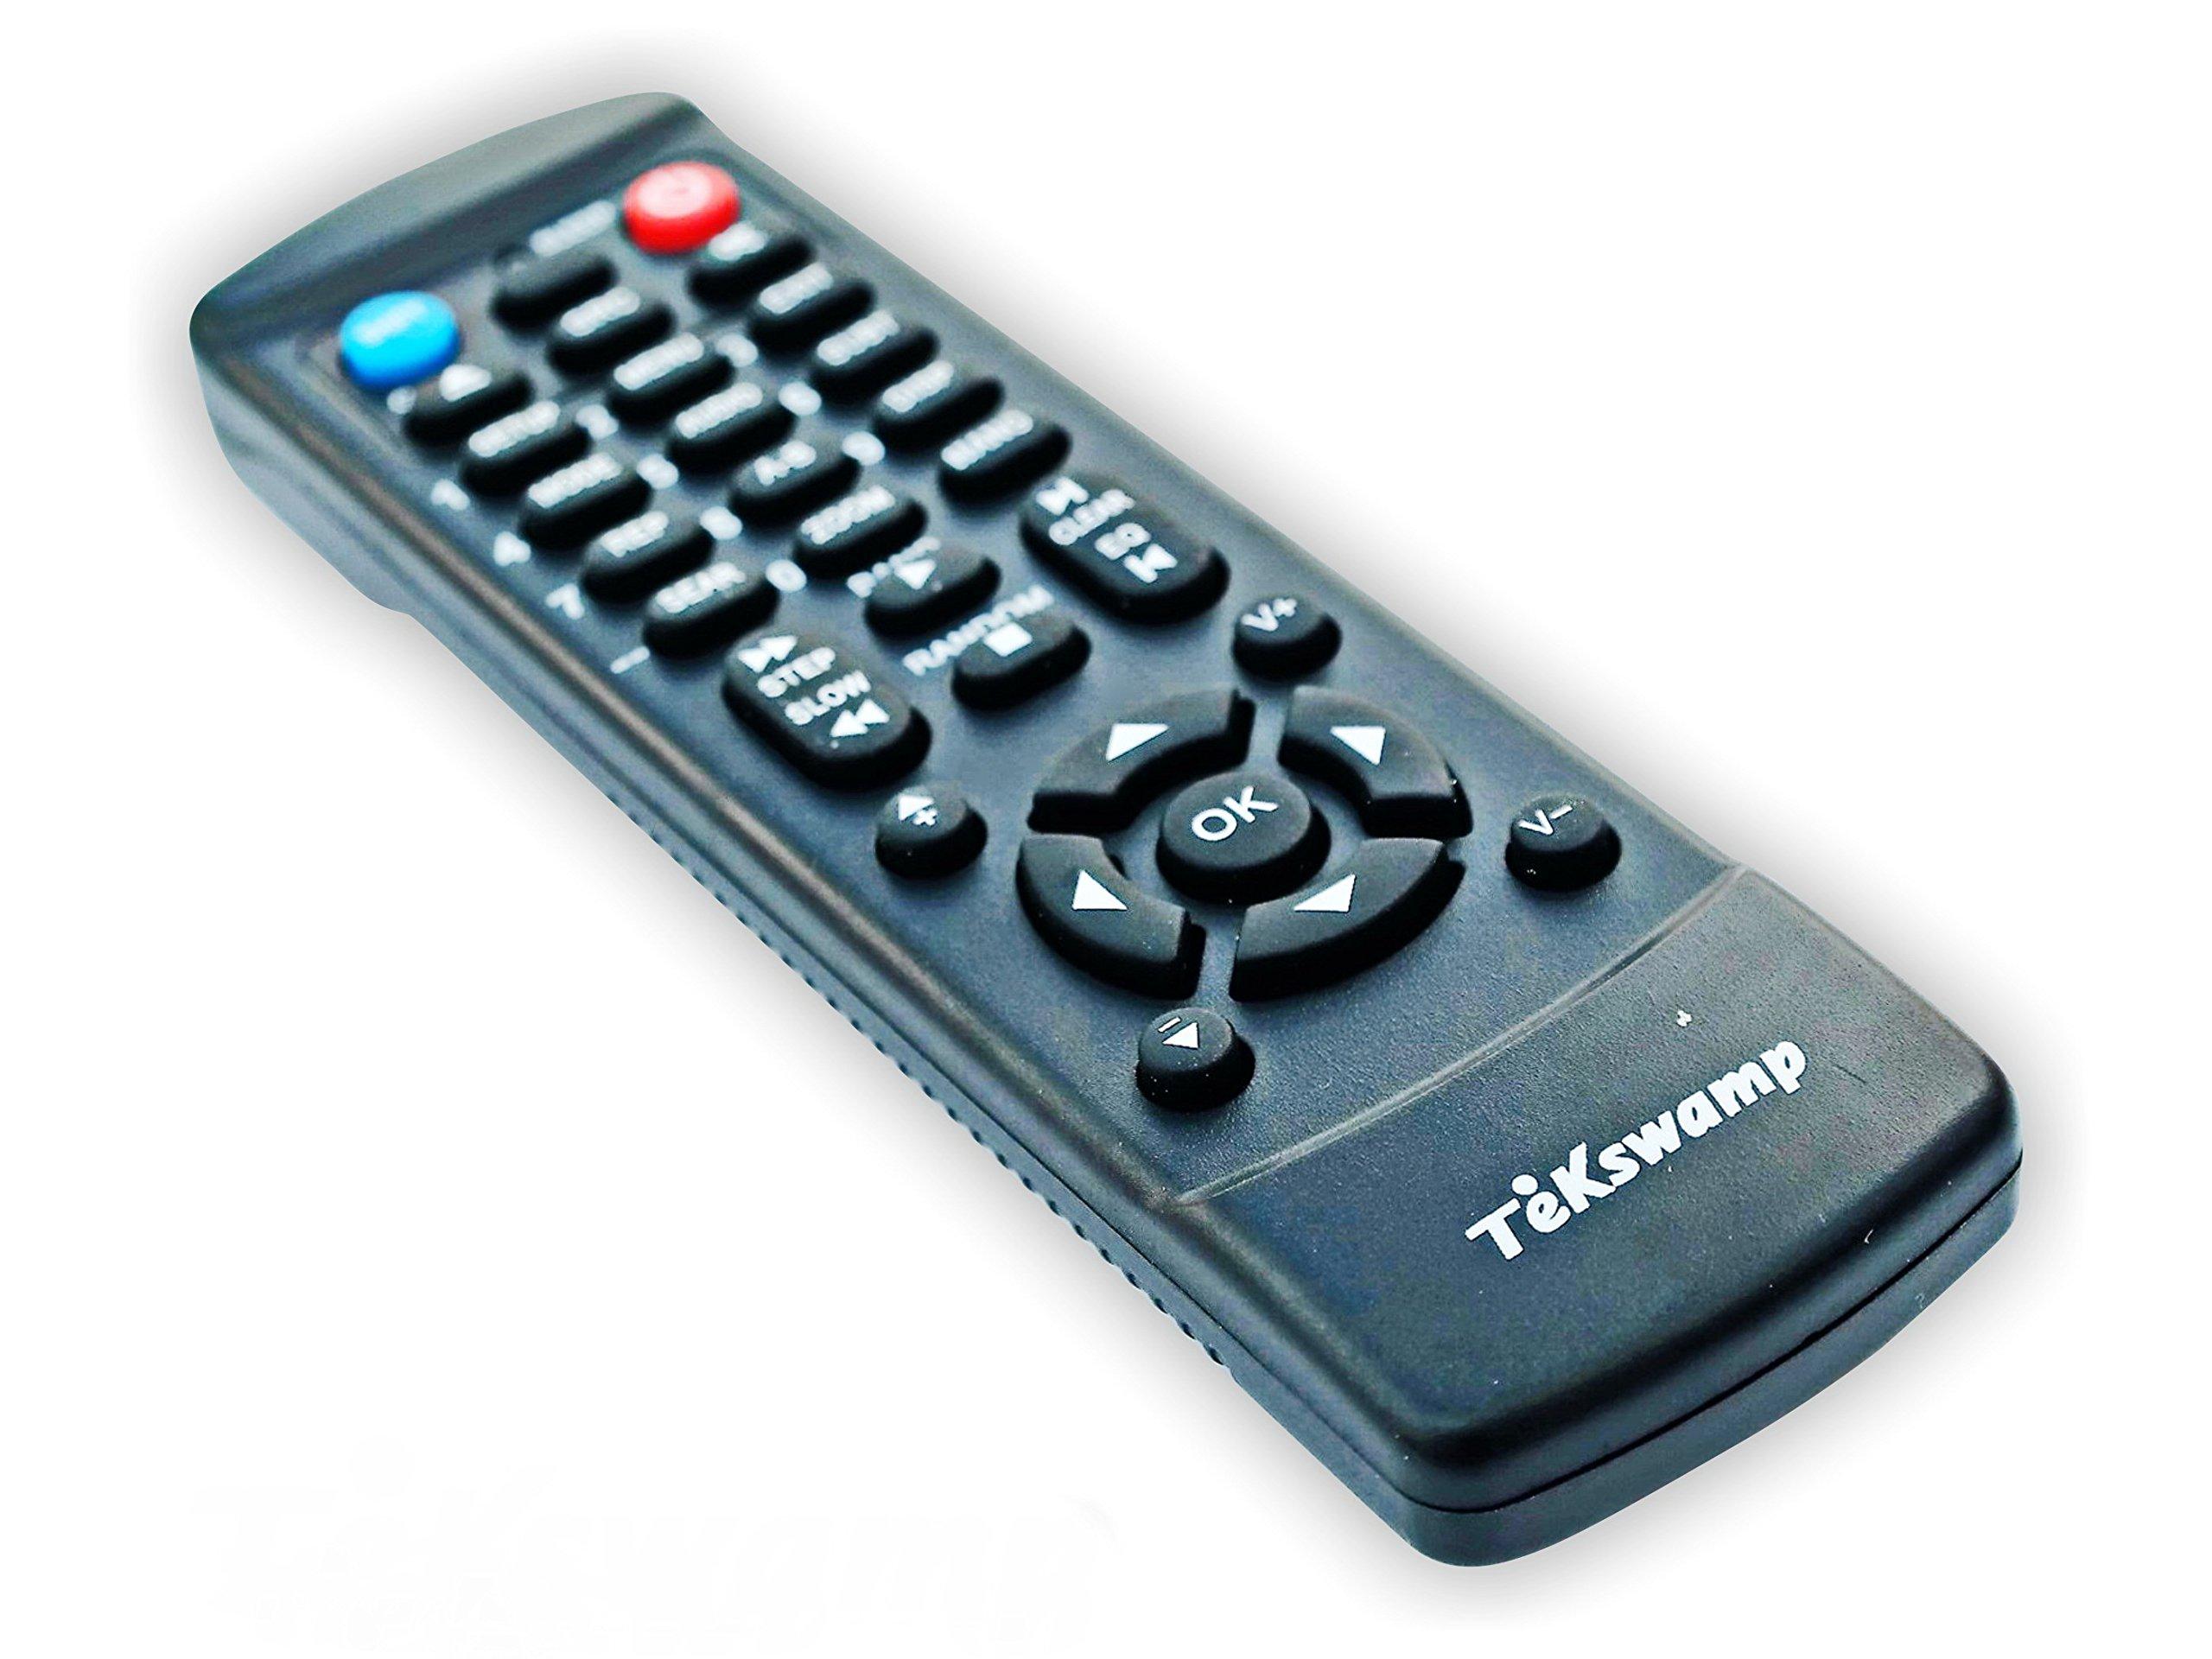 Remote Control for Samsung HT-DS100 by Tekswamp by Tekswamp (Image #2)